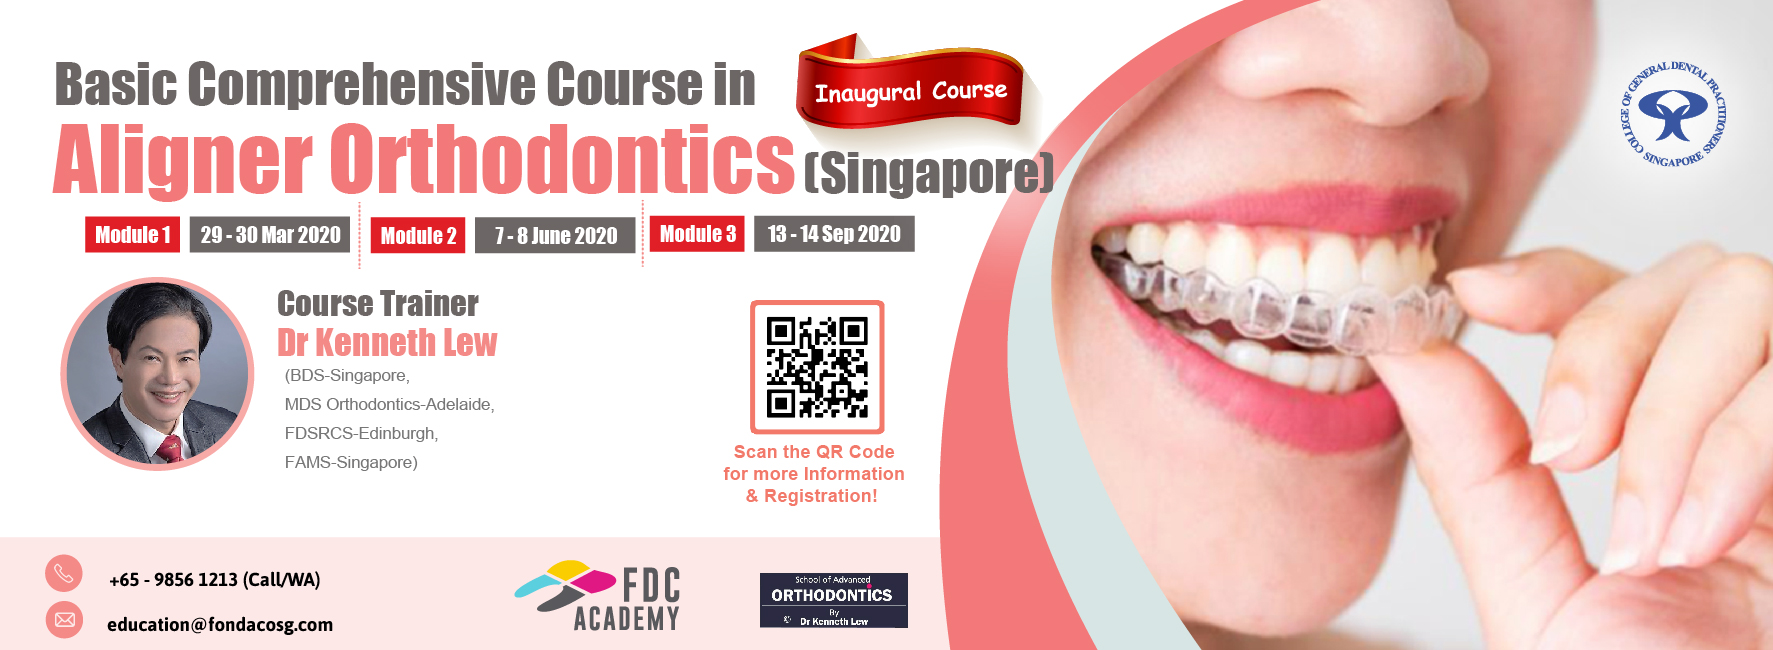 Basic Course in Aligner Orthodontic Banner Image